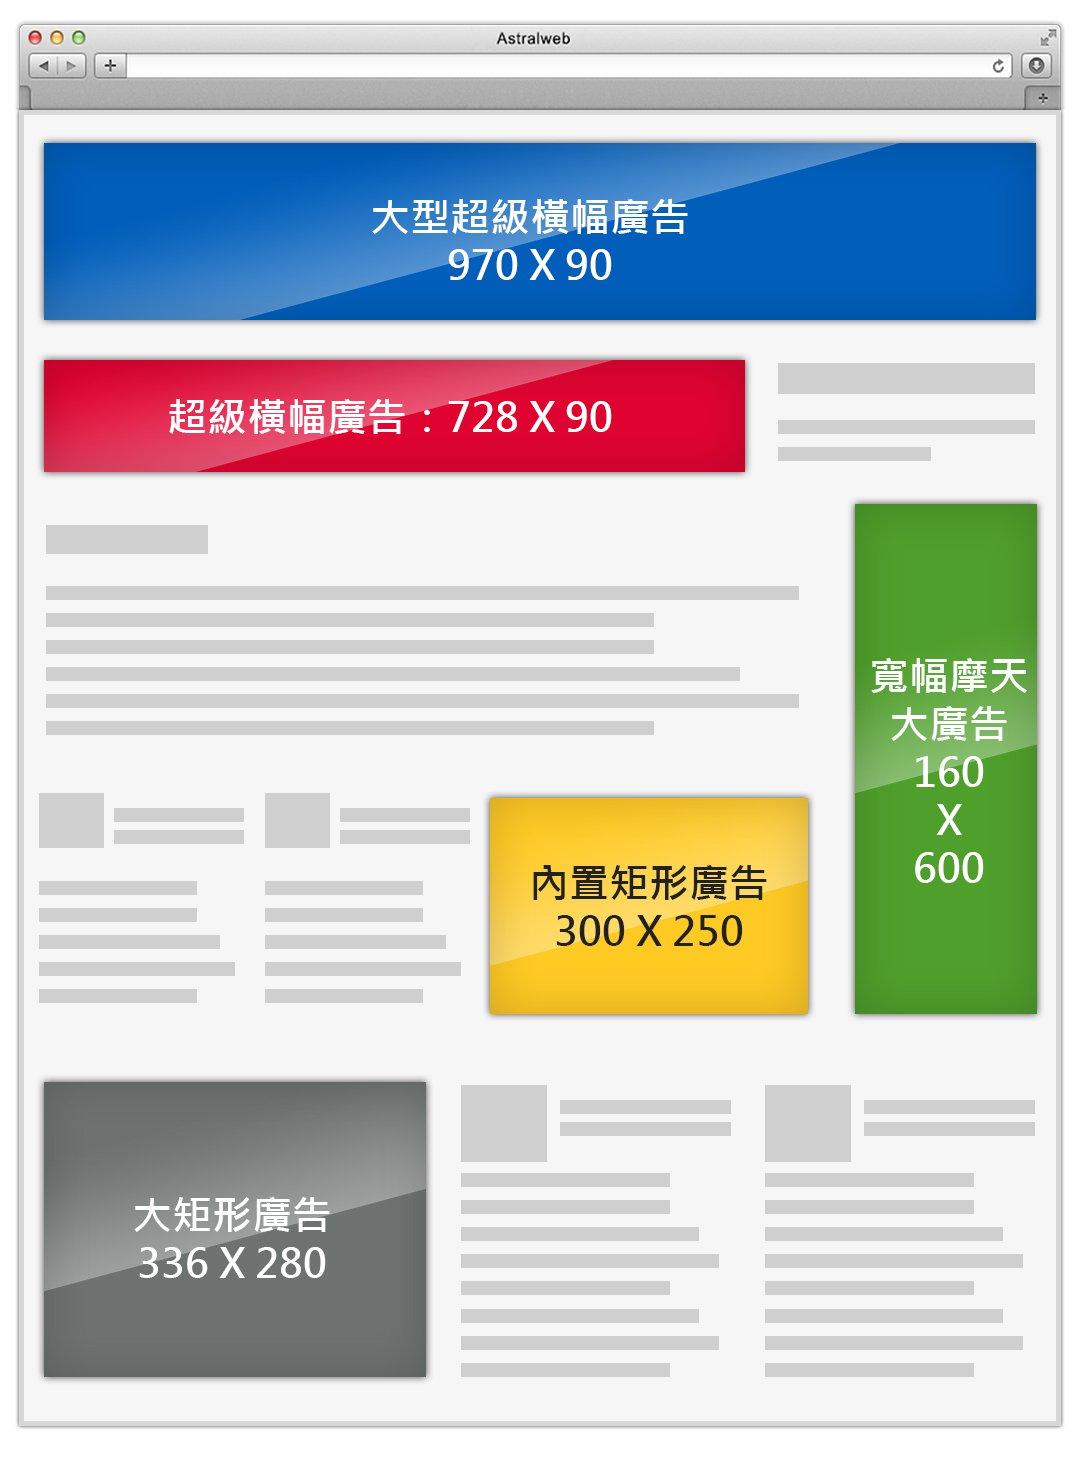 Google Adwords廣告圖像建議尺寸